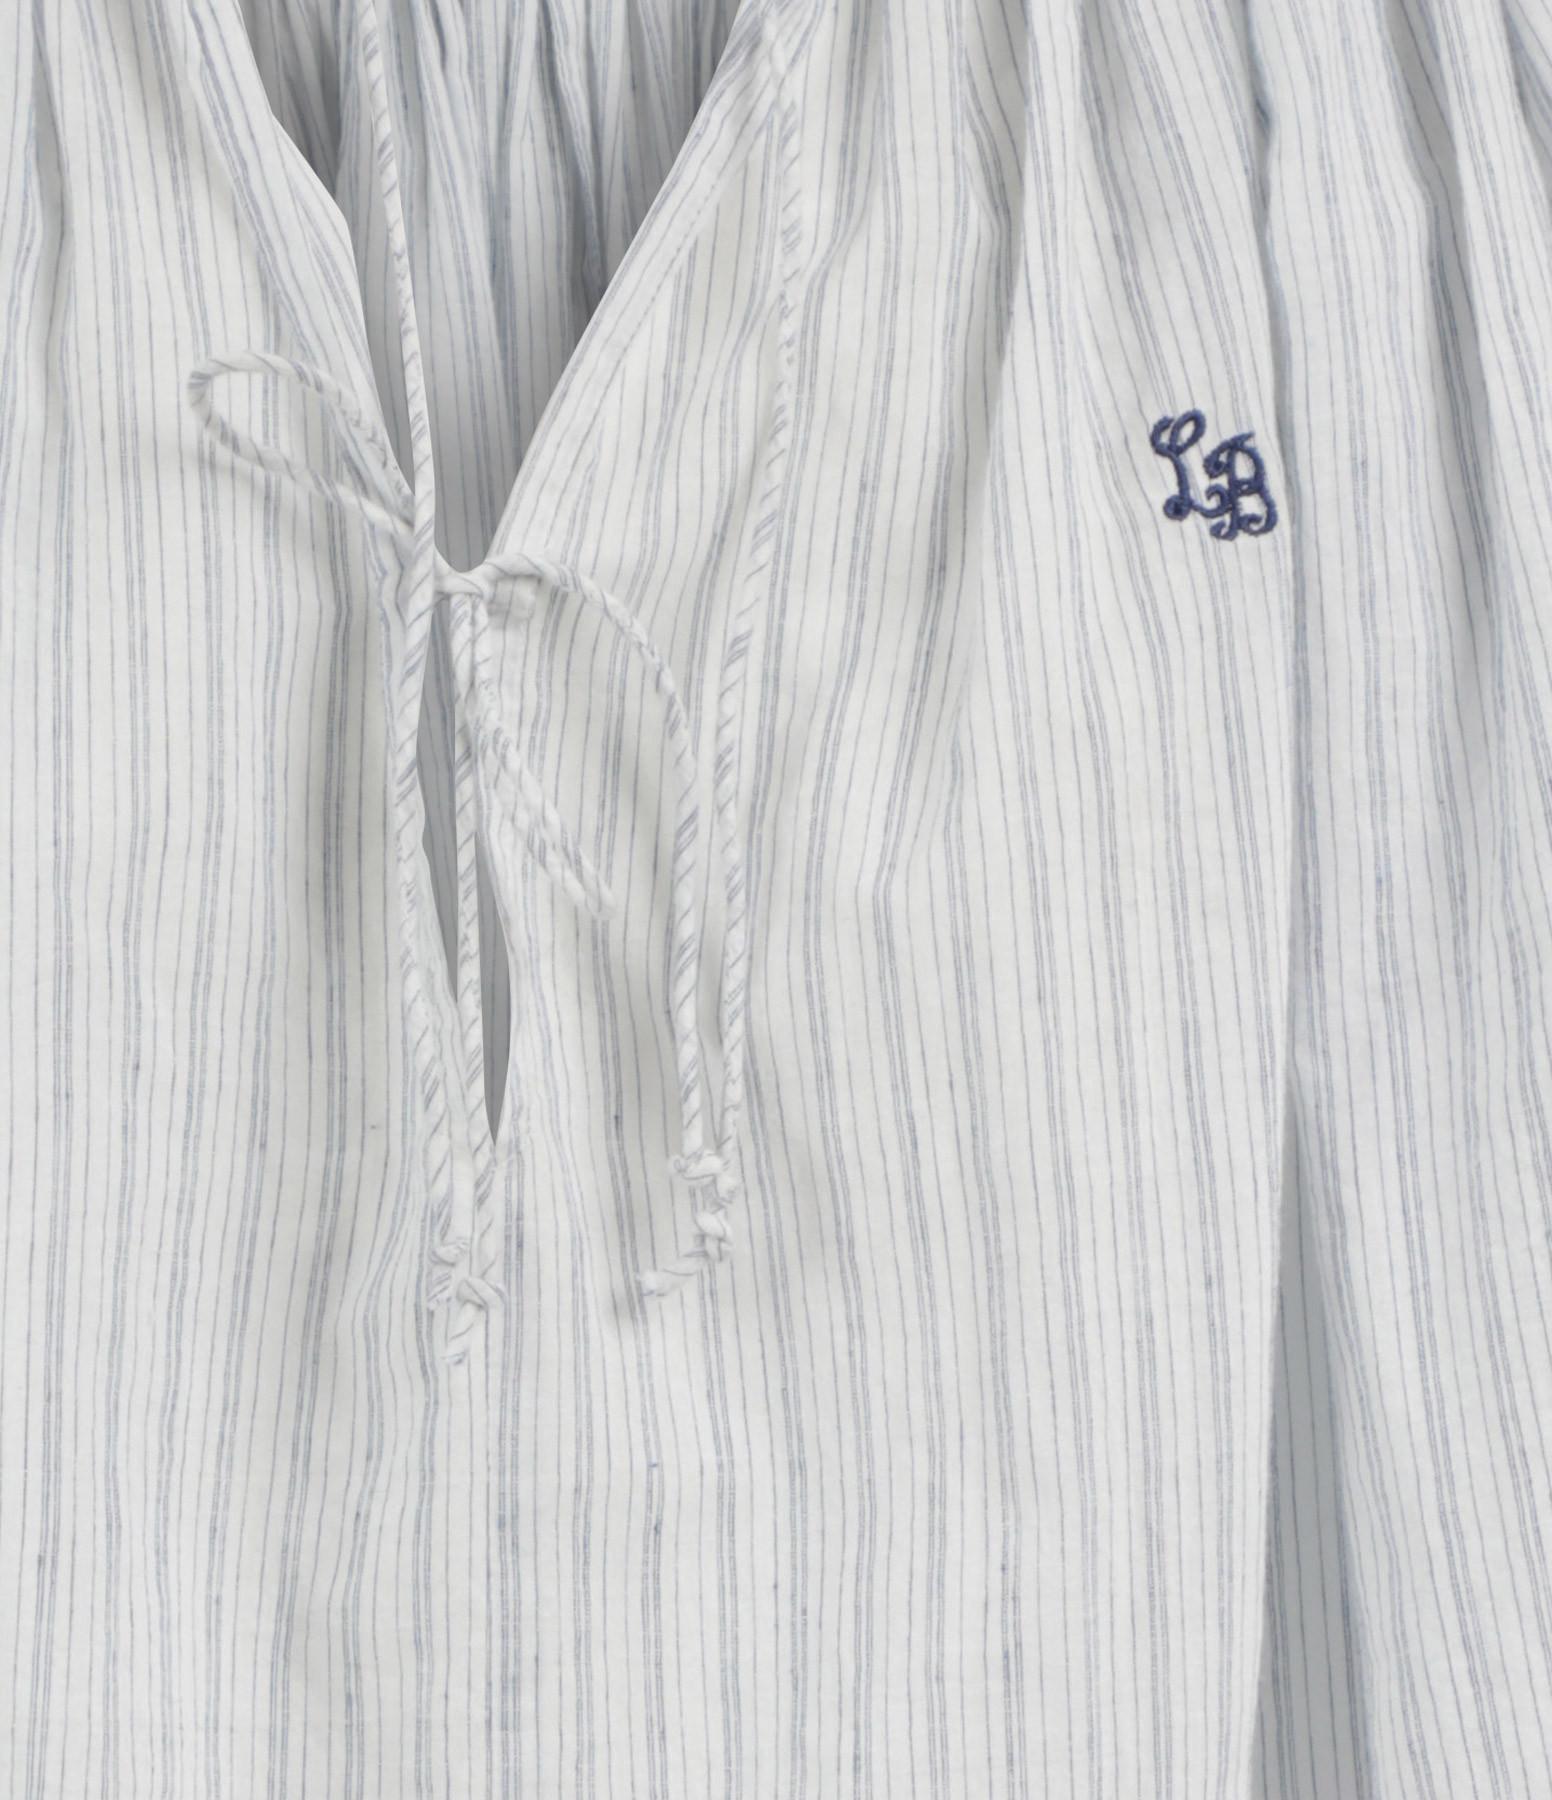 LAURENCE BRAS - Blouse New Cigar Rayures Bleu